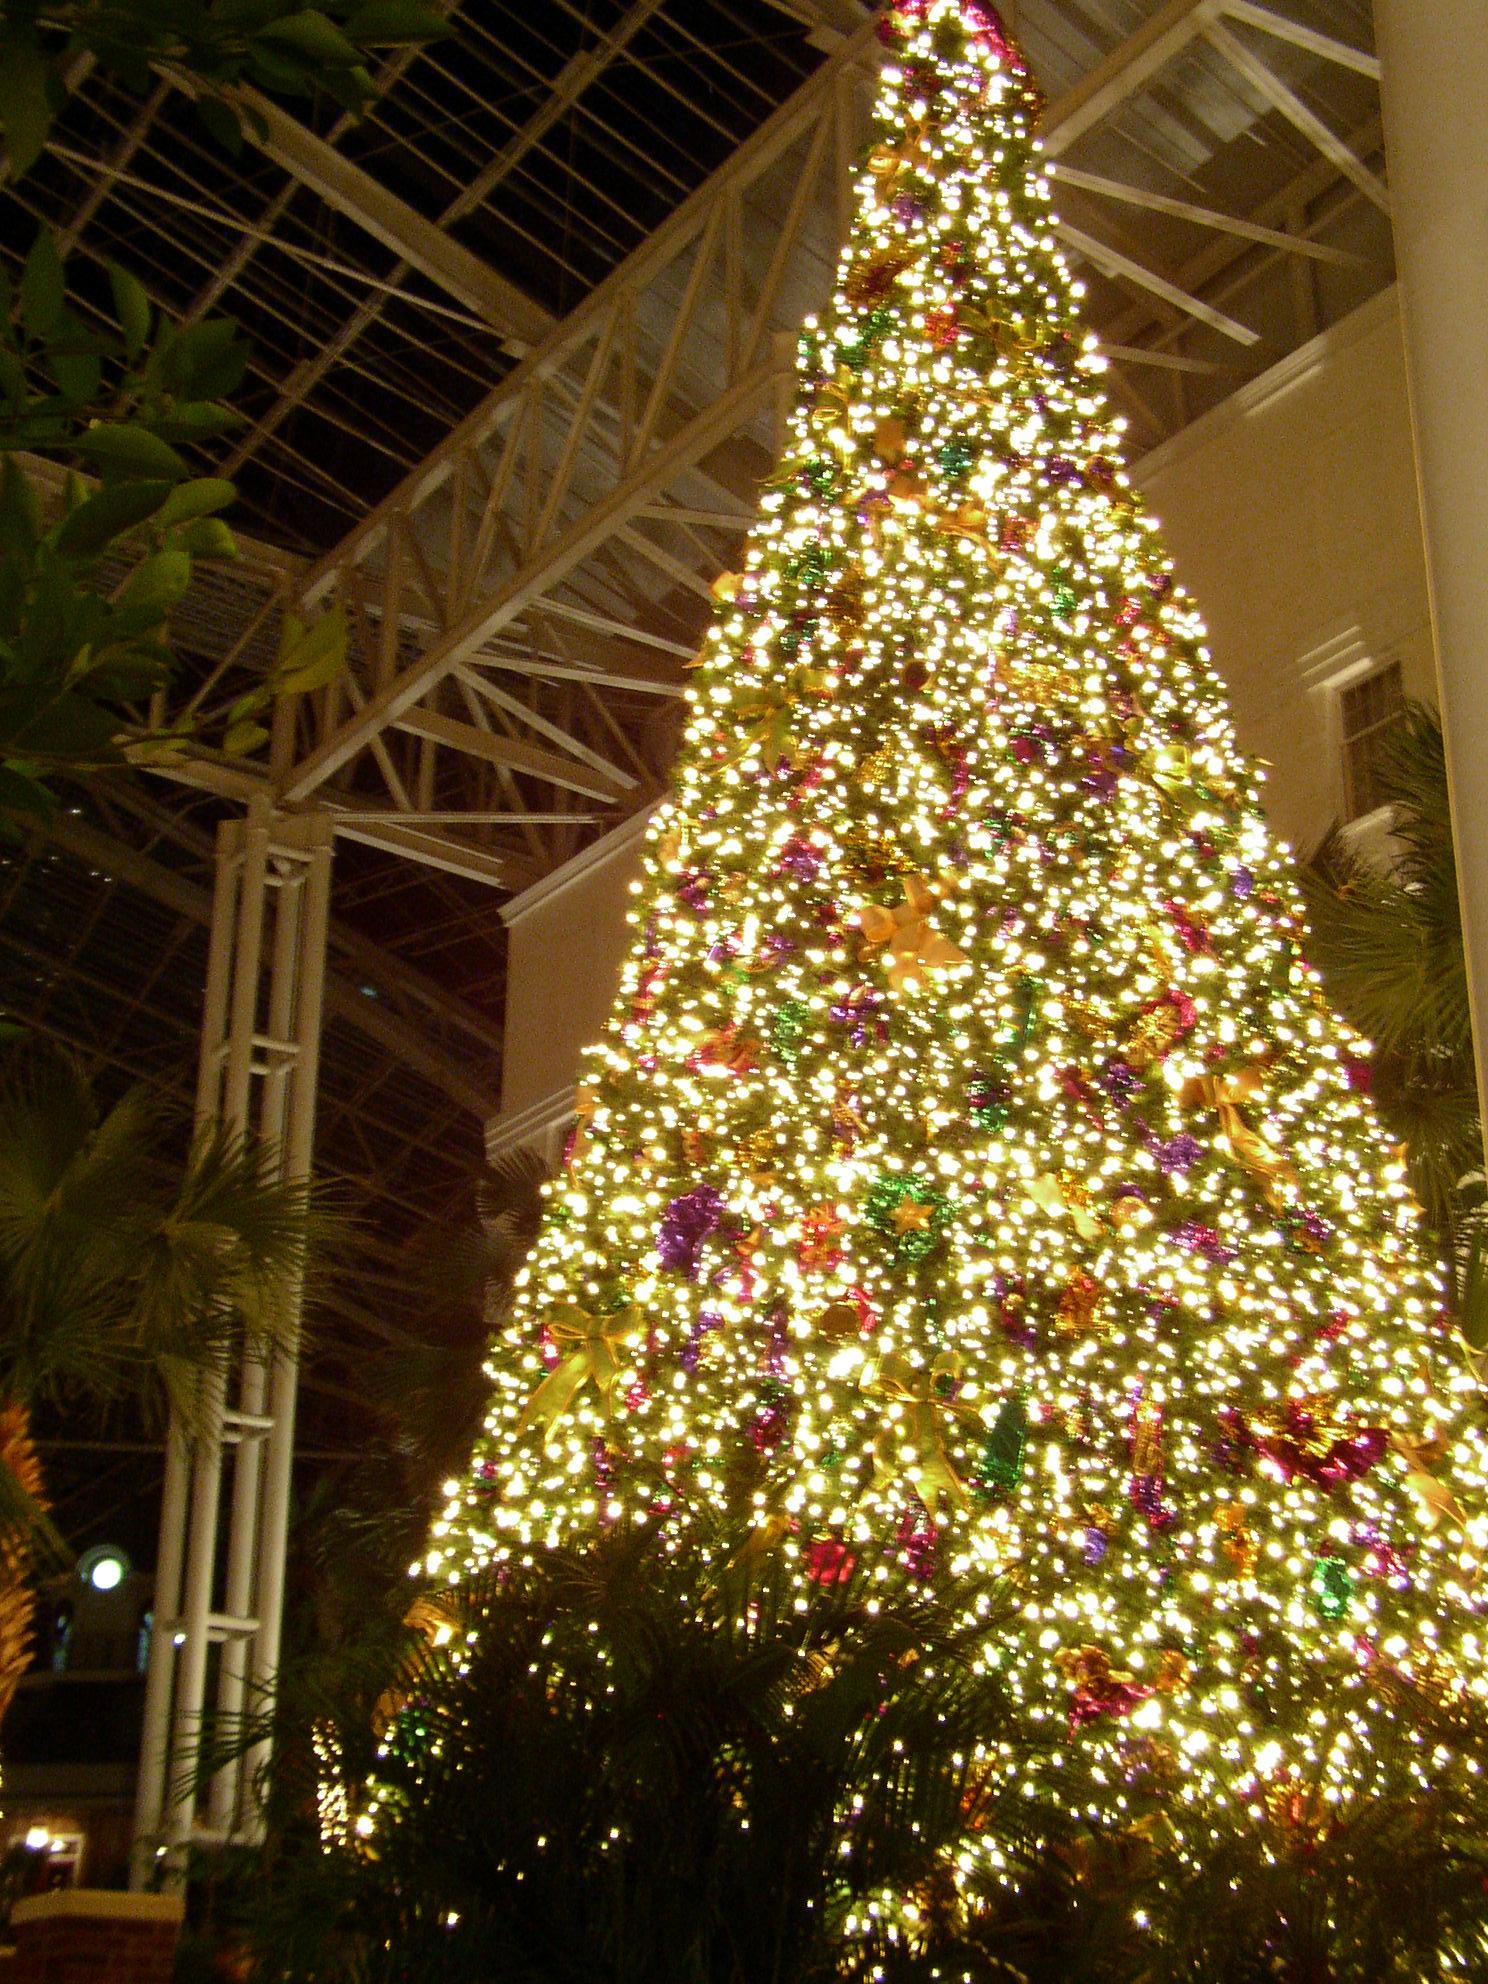 1488 1984 pixels christmas tree in opryland hotel